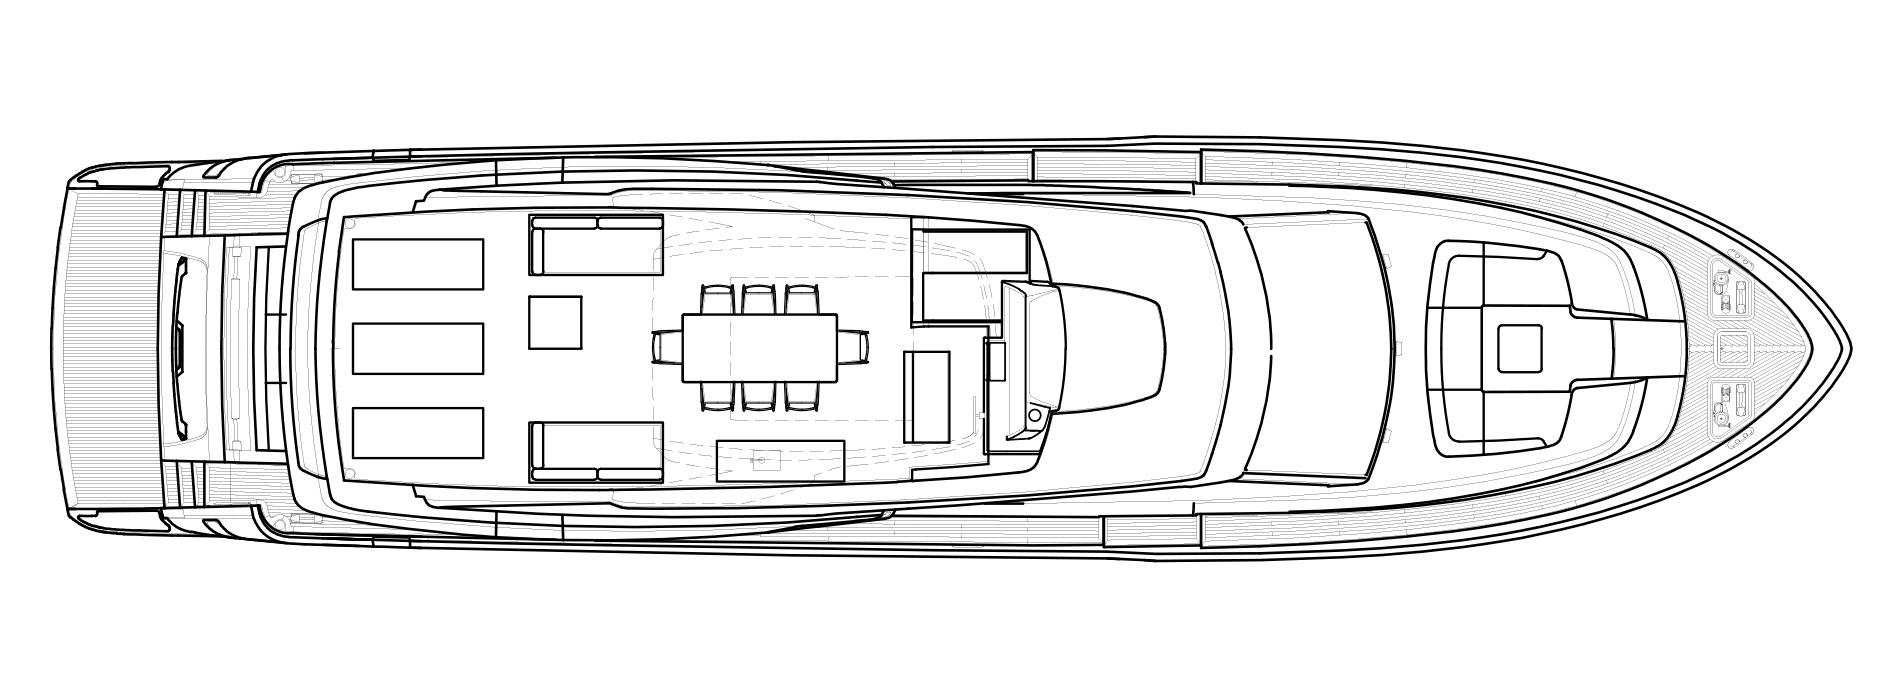 Sanlorenzo Yachts SL86 飞桥 Versione A